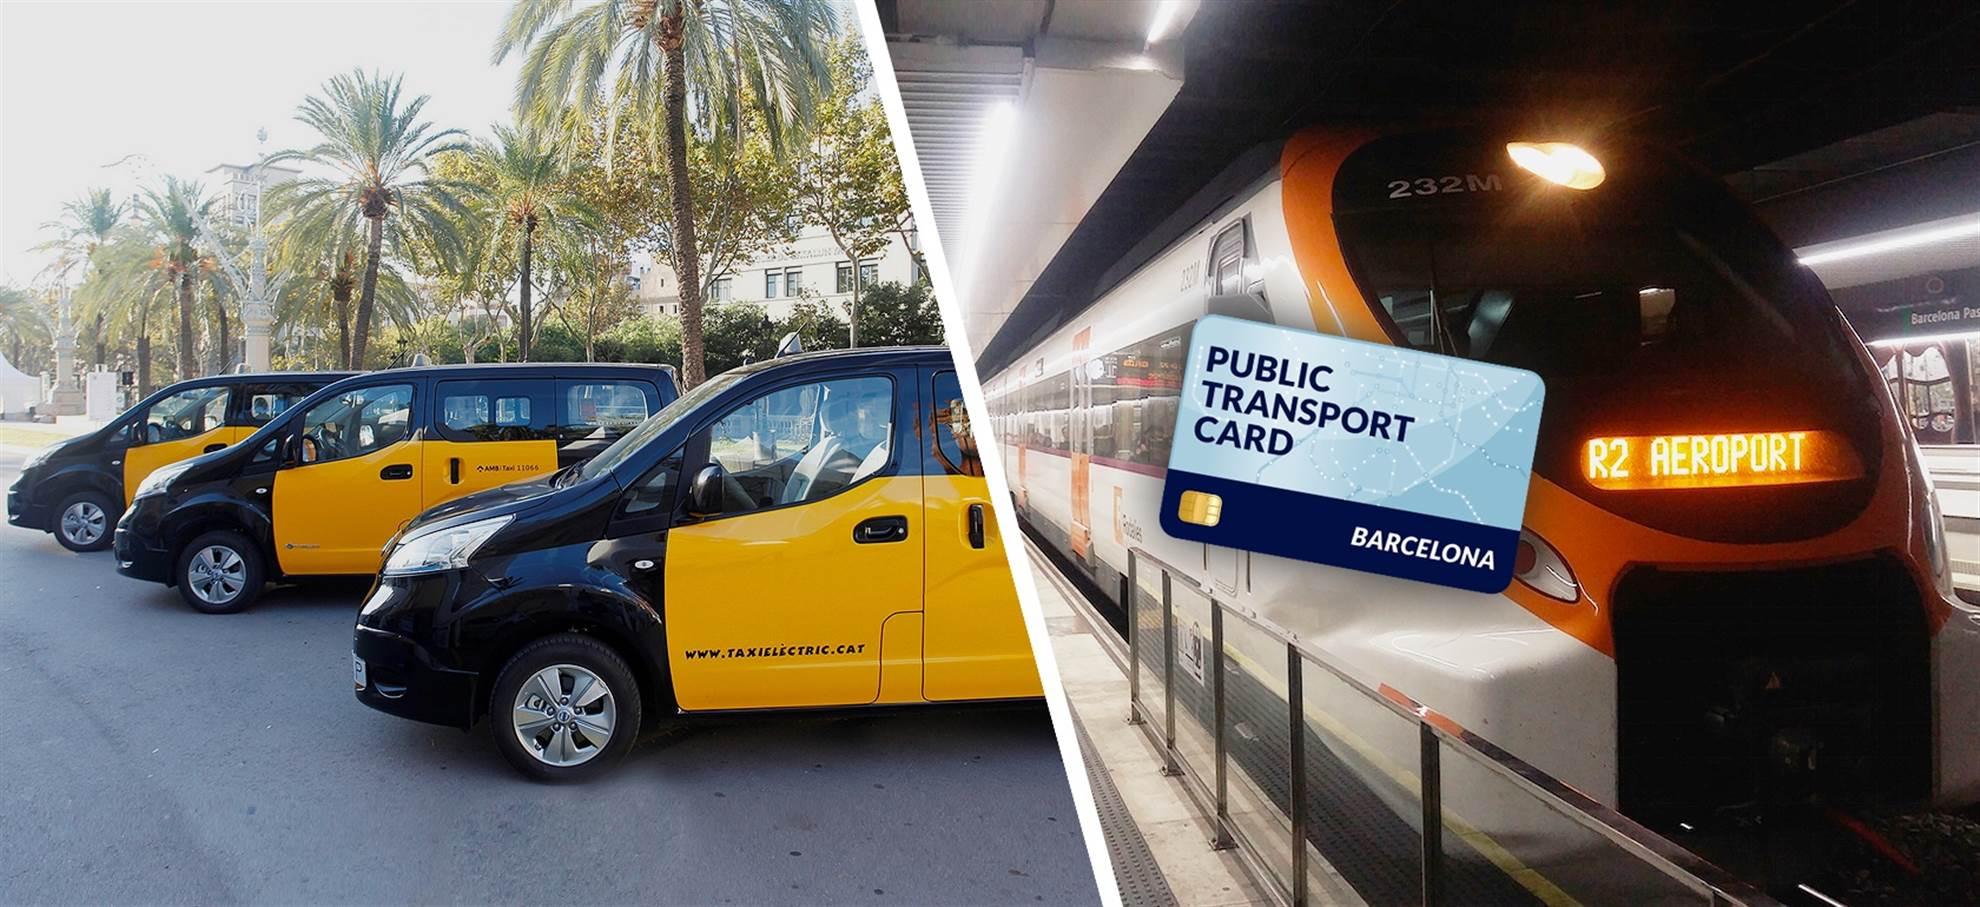 Barcelone Travel Card